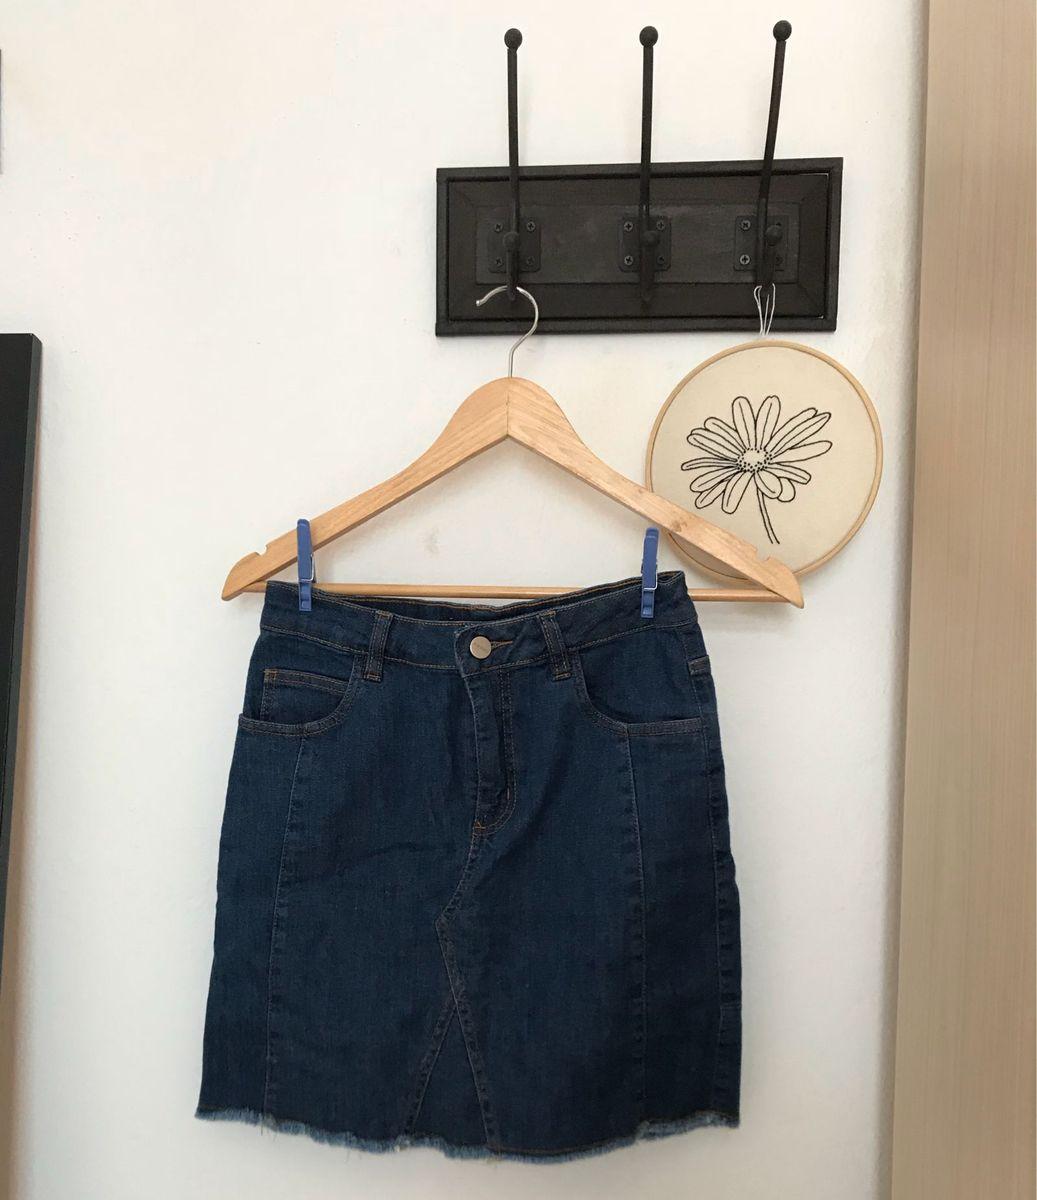 ec4a3d1a50 saia jeans amaro - saias amaro.  Czm6ly9wag90b3muzw5qb2vplmnvbs5ici9wcm9kdwn0cy82mdk4mdexl2u4yjrhmjnknjbhowy3ndbhognhnjvkyjnjownjm2m4lmpwzw  ...